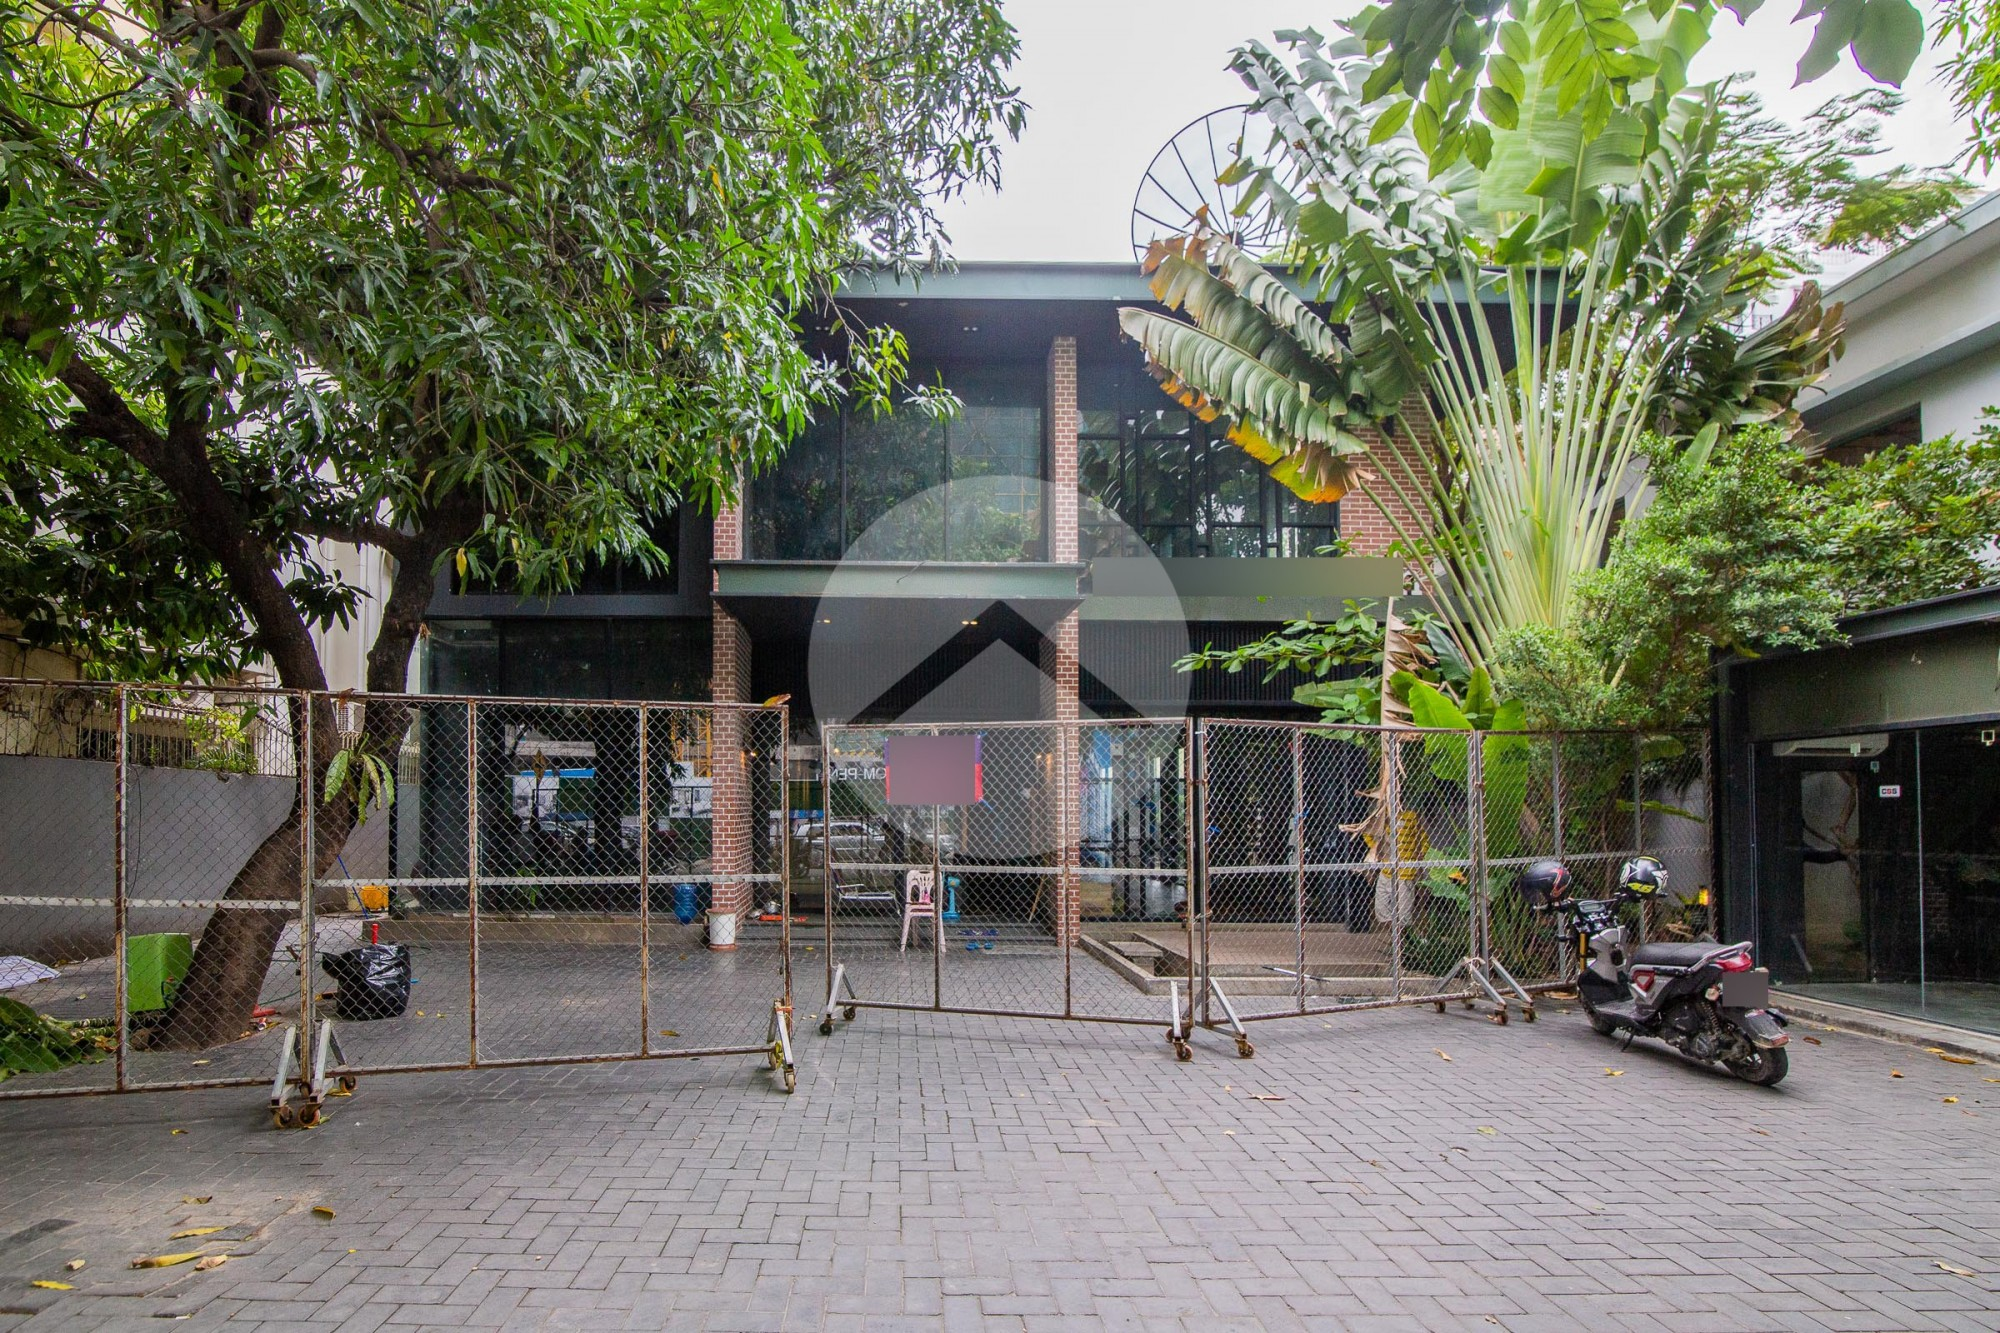 375 Sqm Commercial Space For Rent - BKK1, Phnom Penh